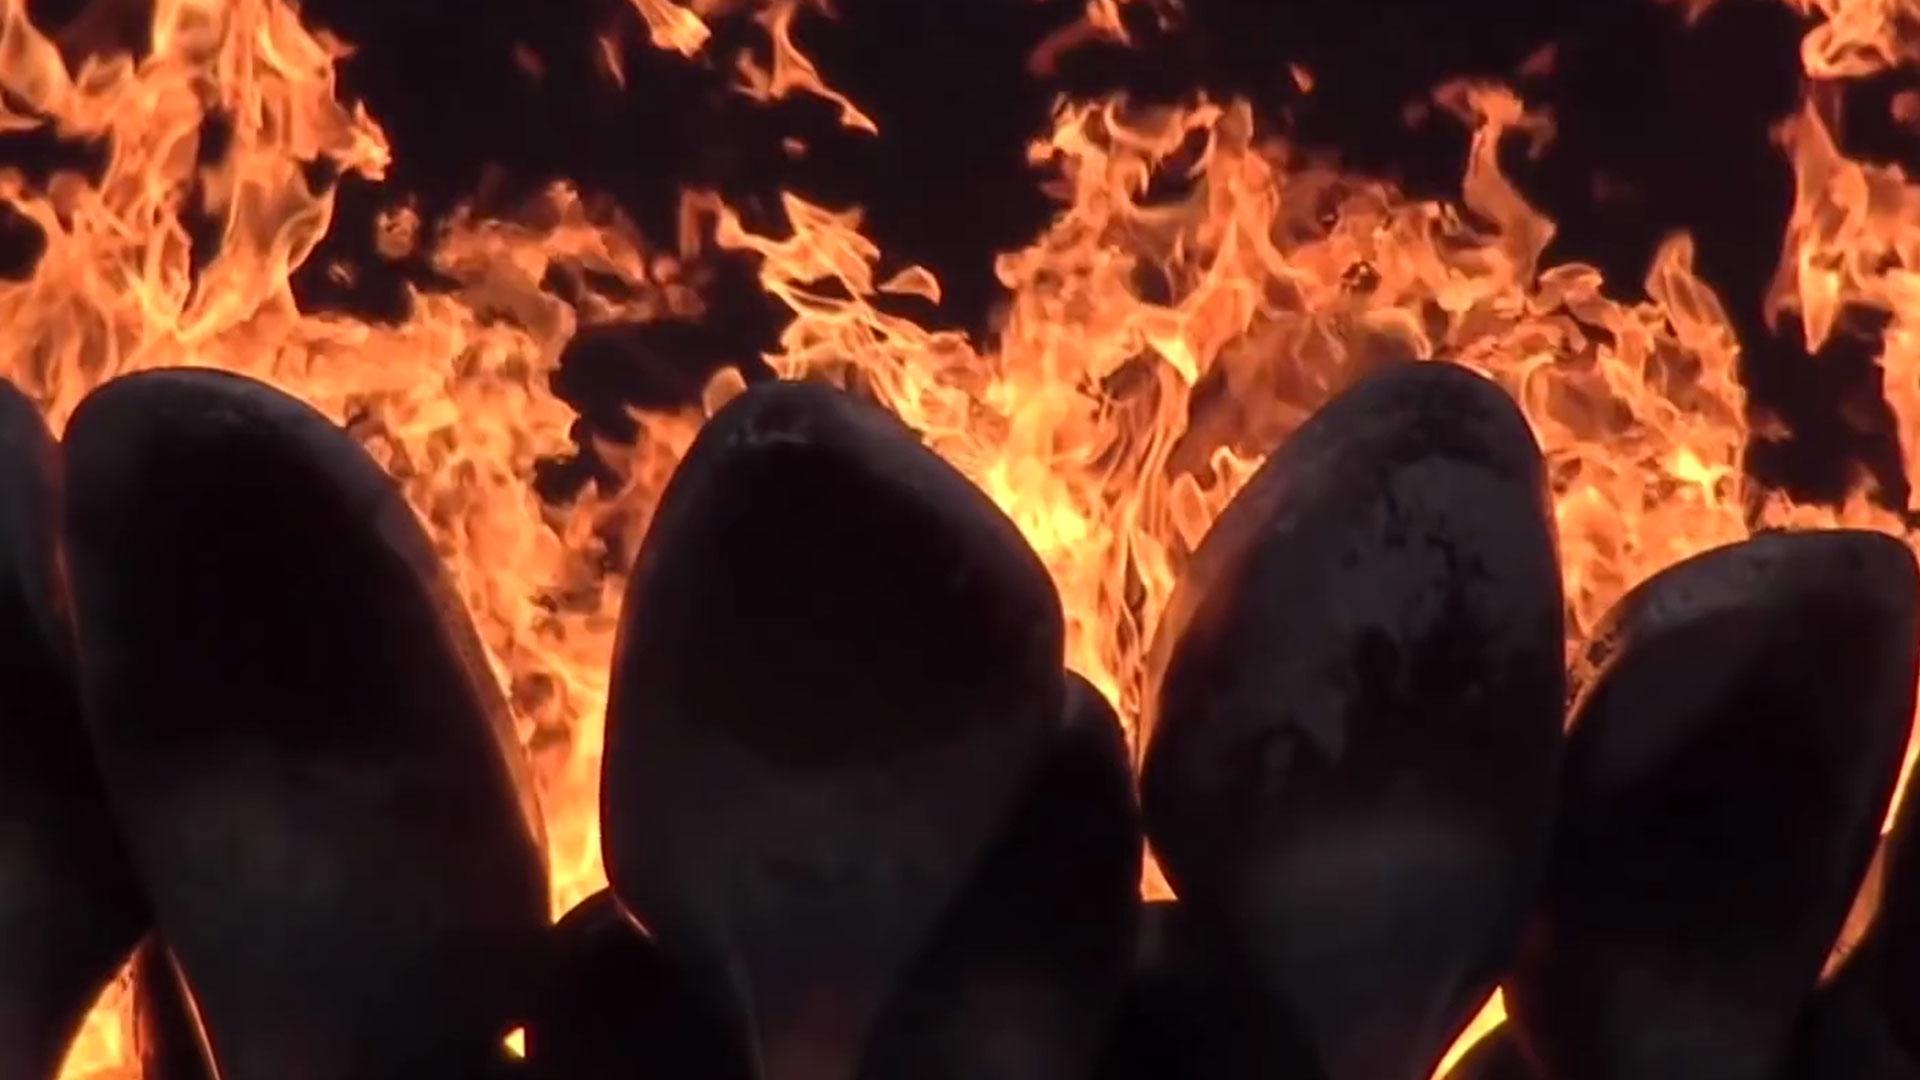 fire flame heat fireplace